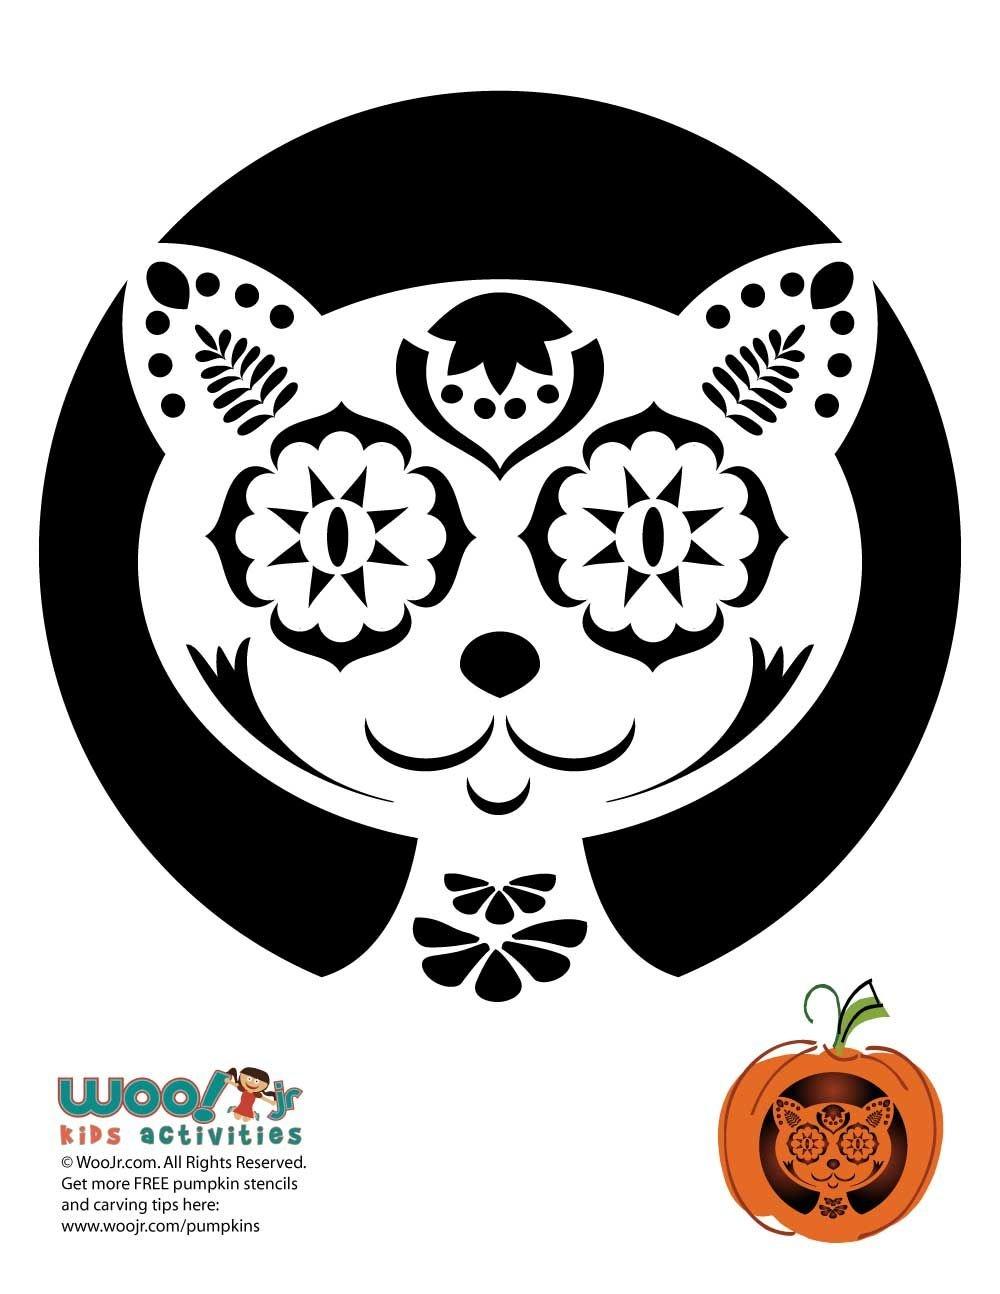 Day Of The Dead Pumpkin Carving Stencils   Mmmm Boo!   Pumpkin - Free Printable Sugar Skull Pumpkin Stencils